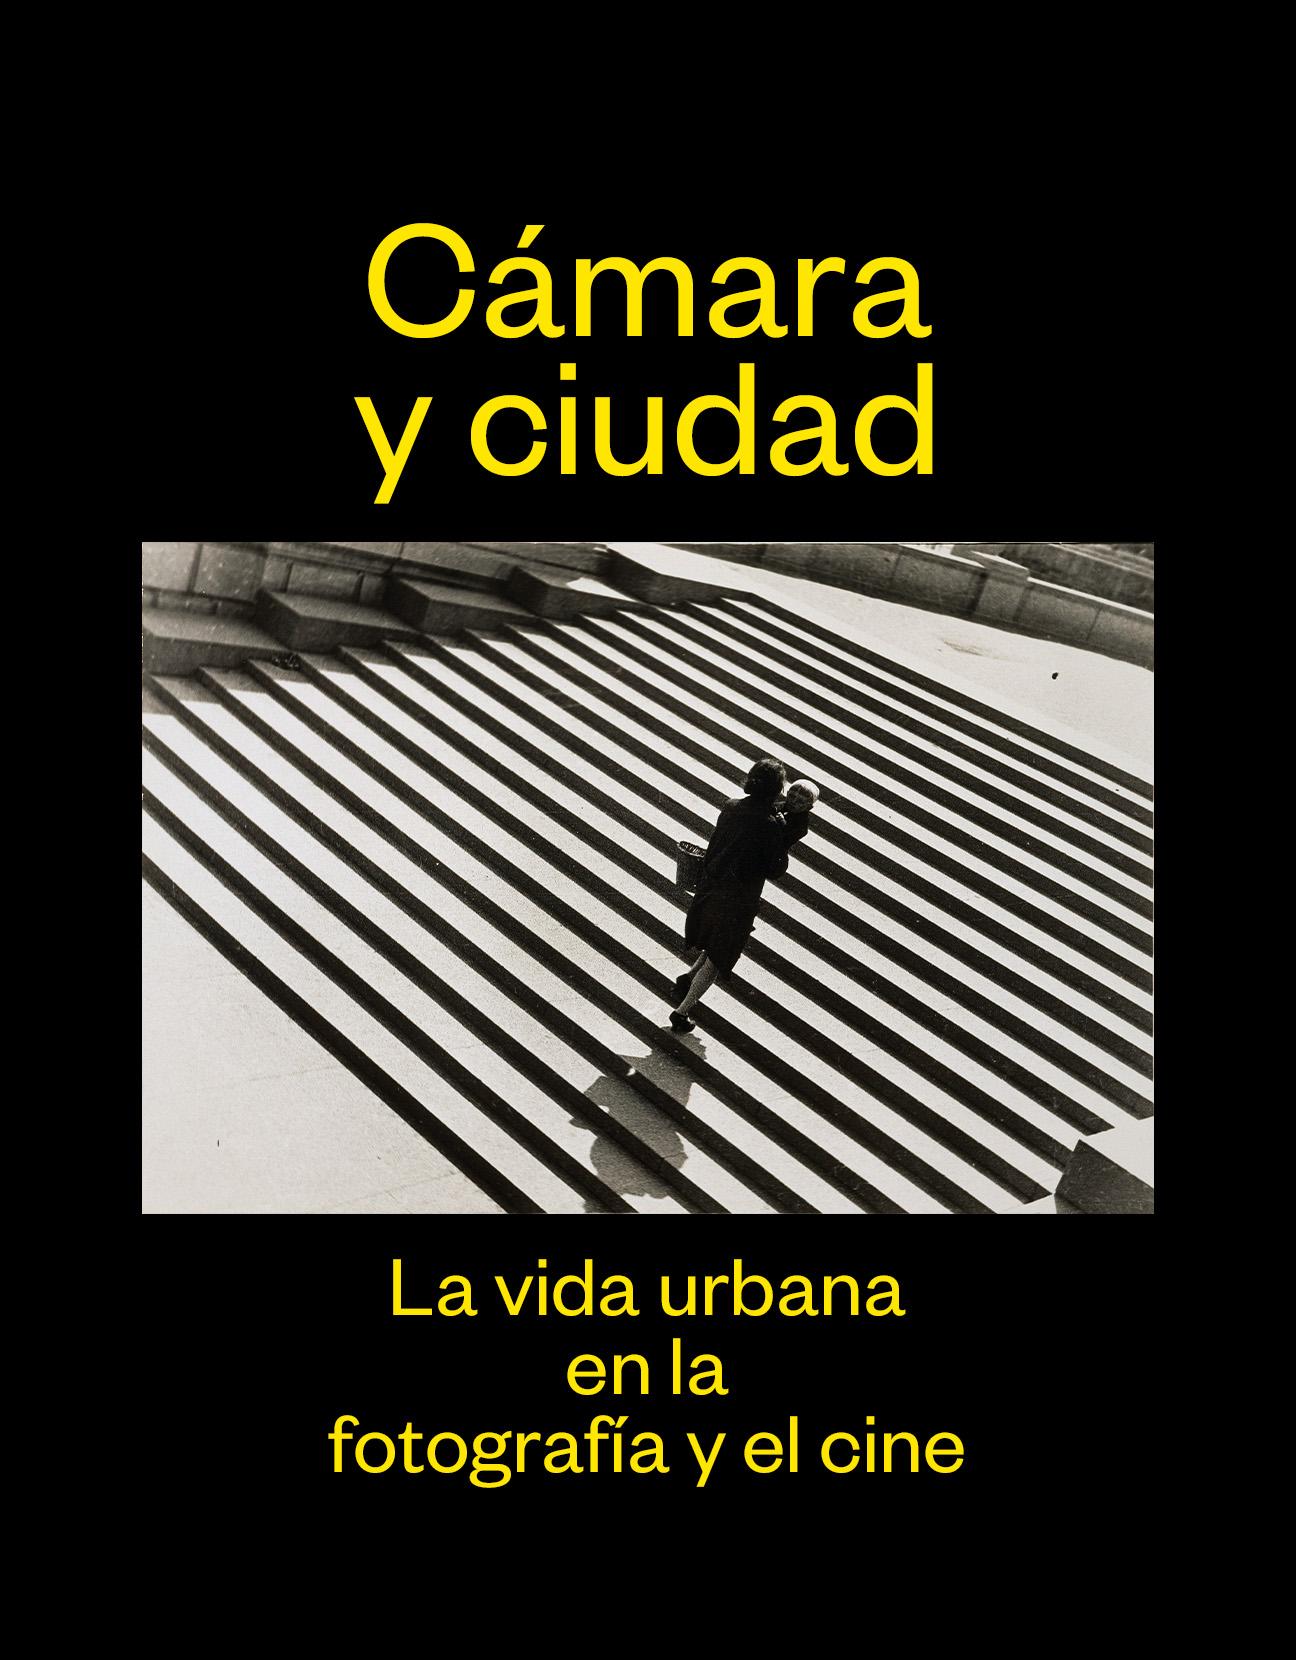 Camera_ombres_cartell_tablet_es